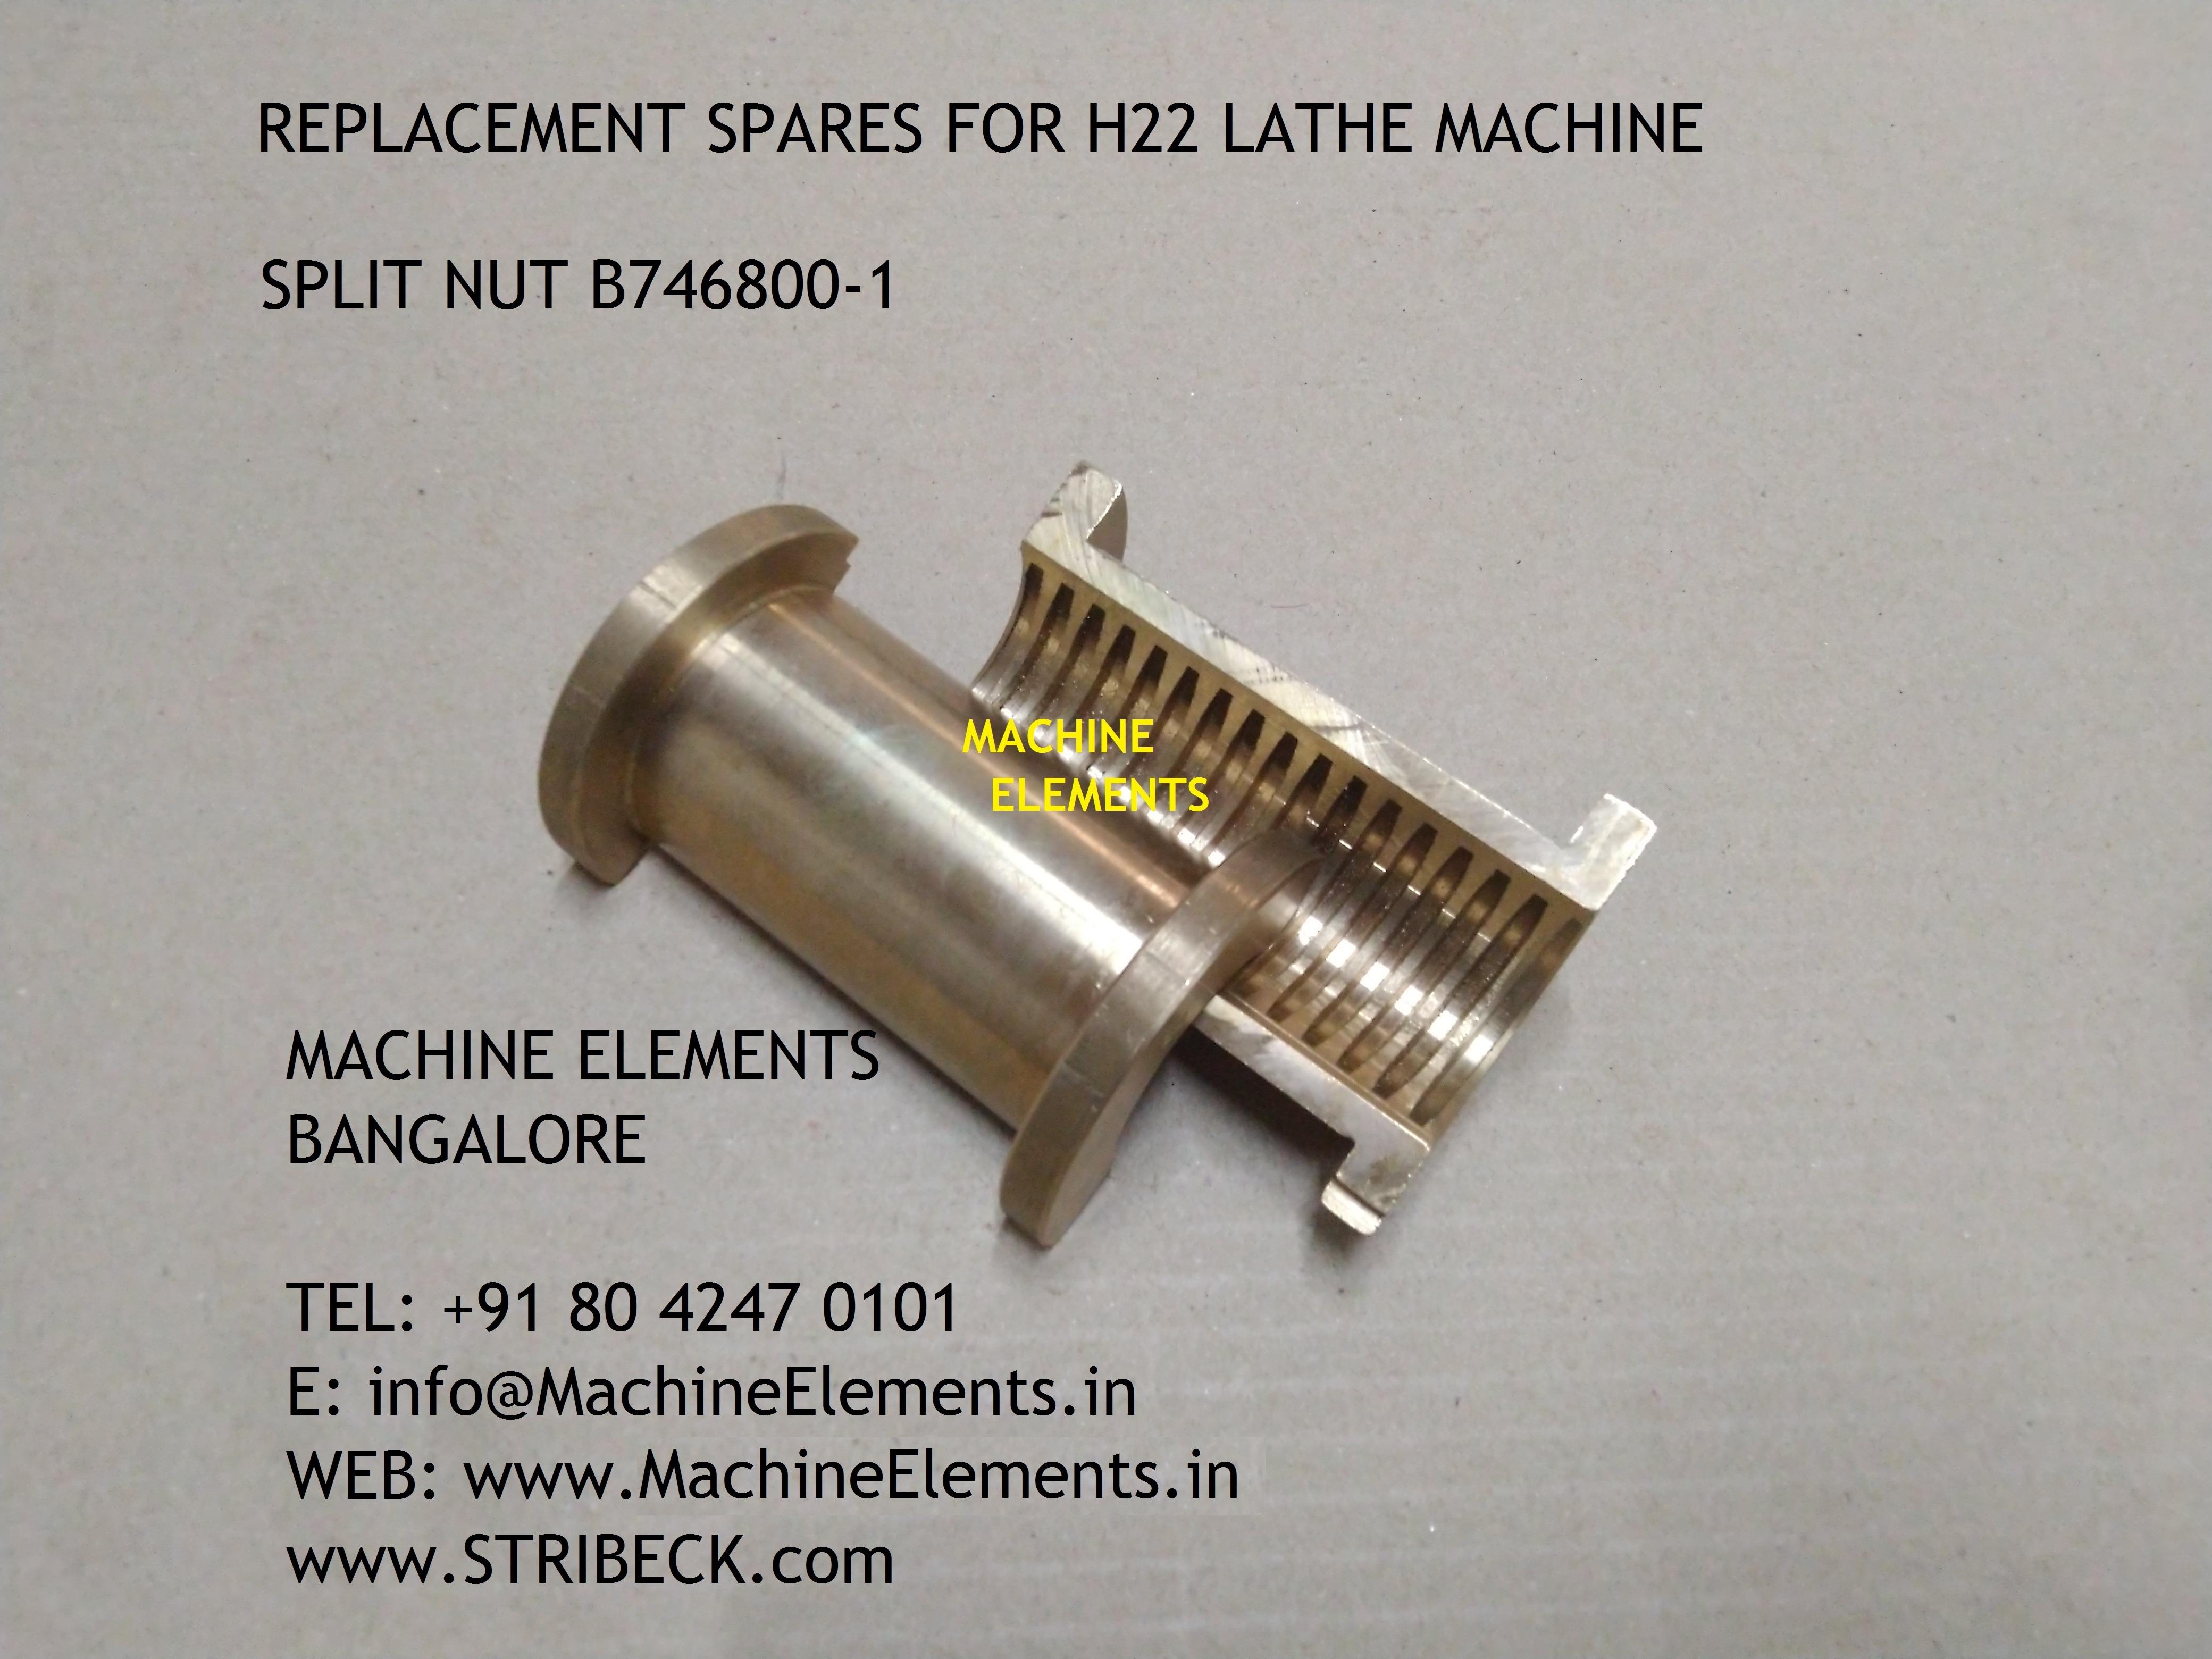 SPLIT NUT B746800-1